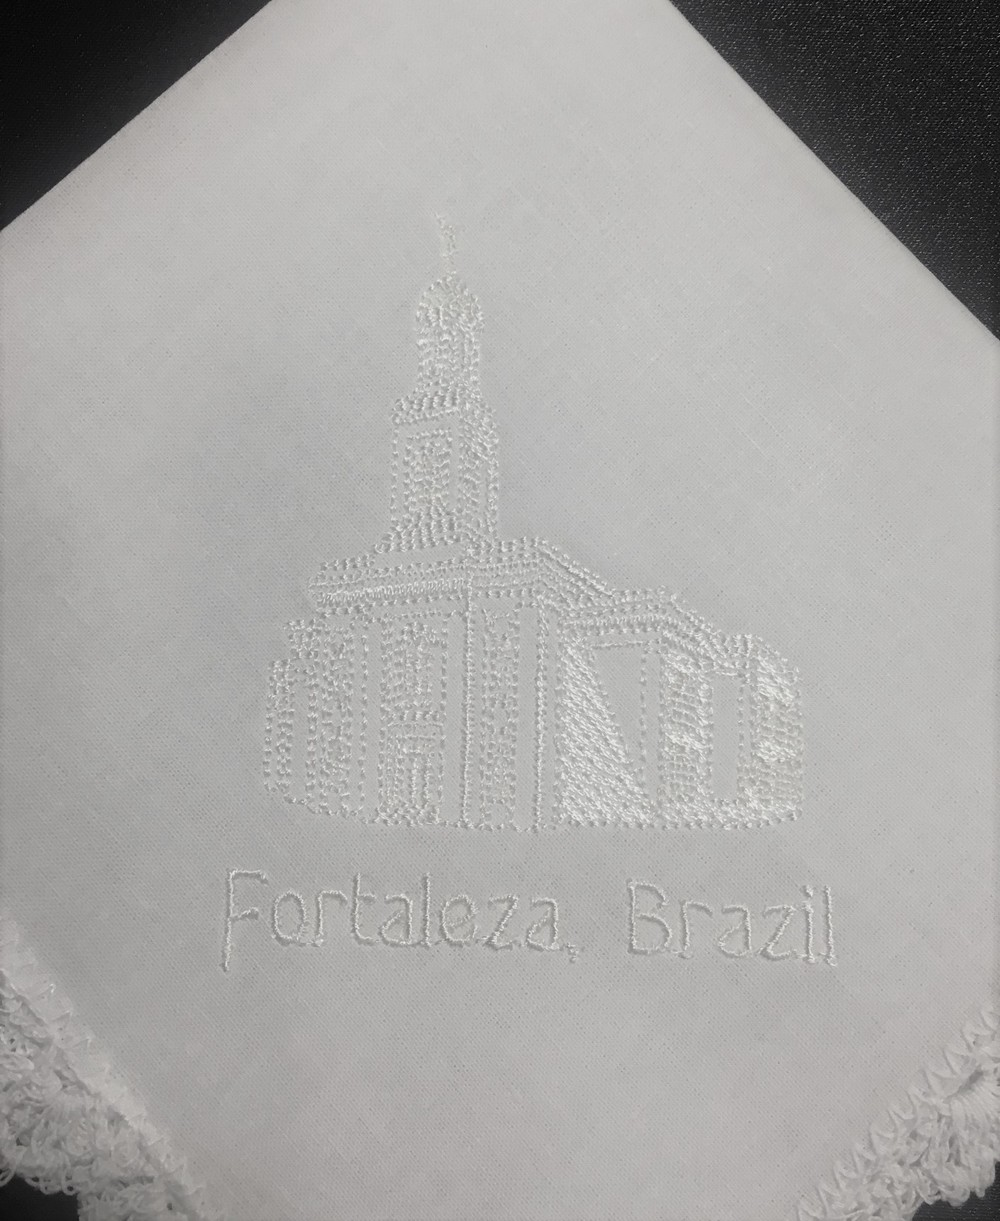 Fortaleza Brazil Women